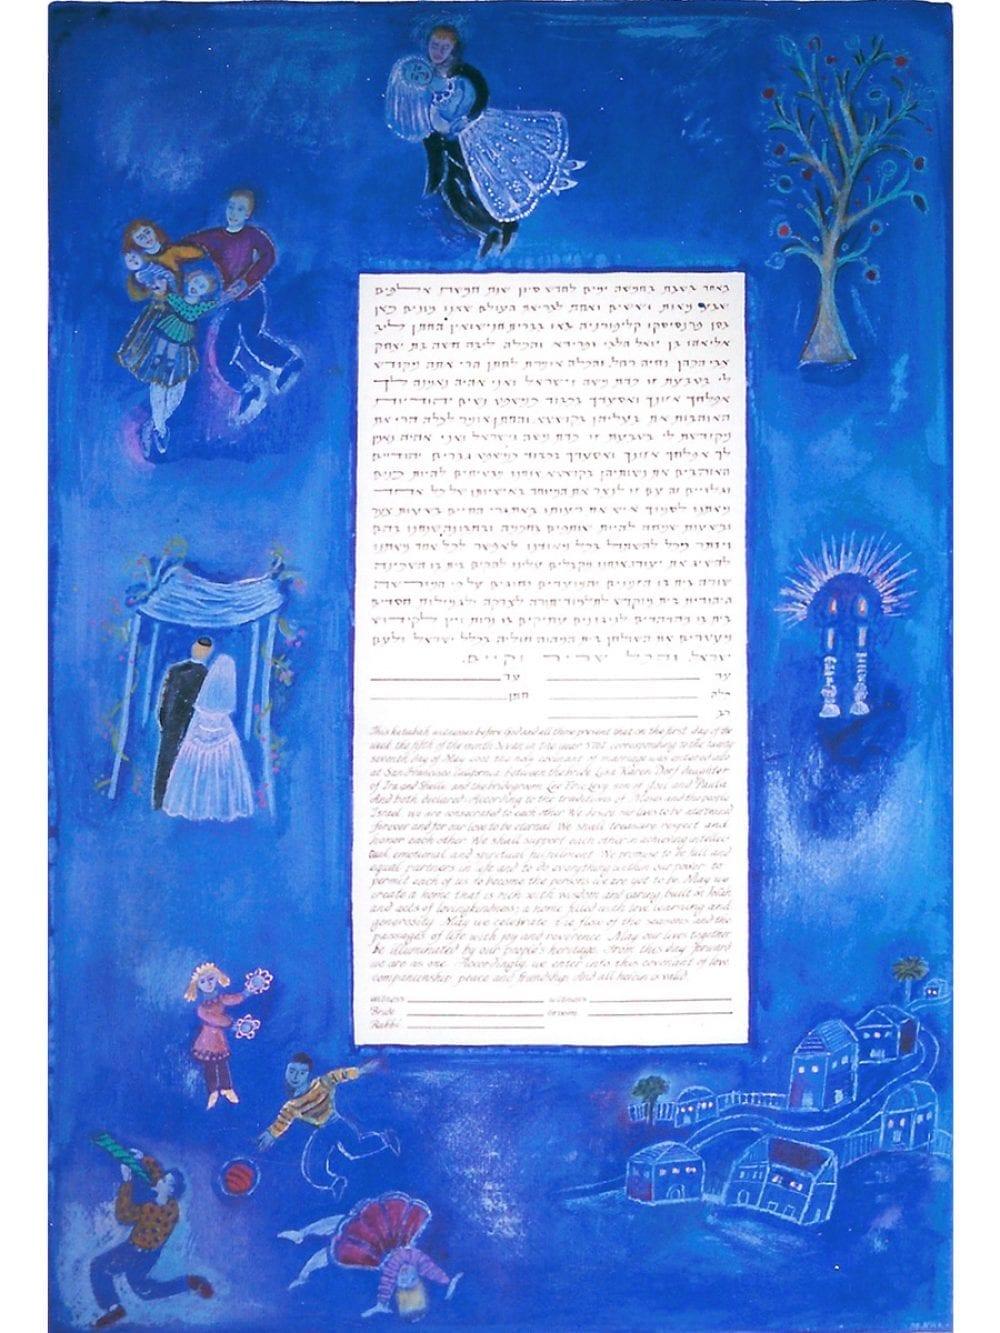 chagall-tumbler-family-ketubah